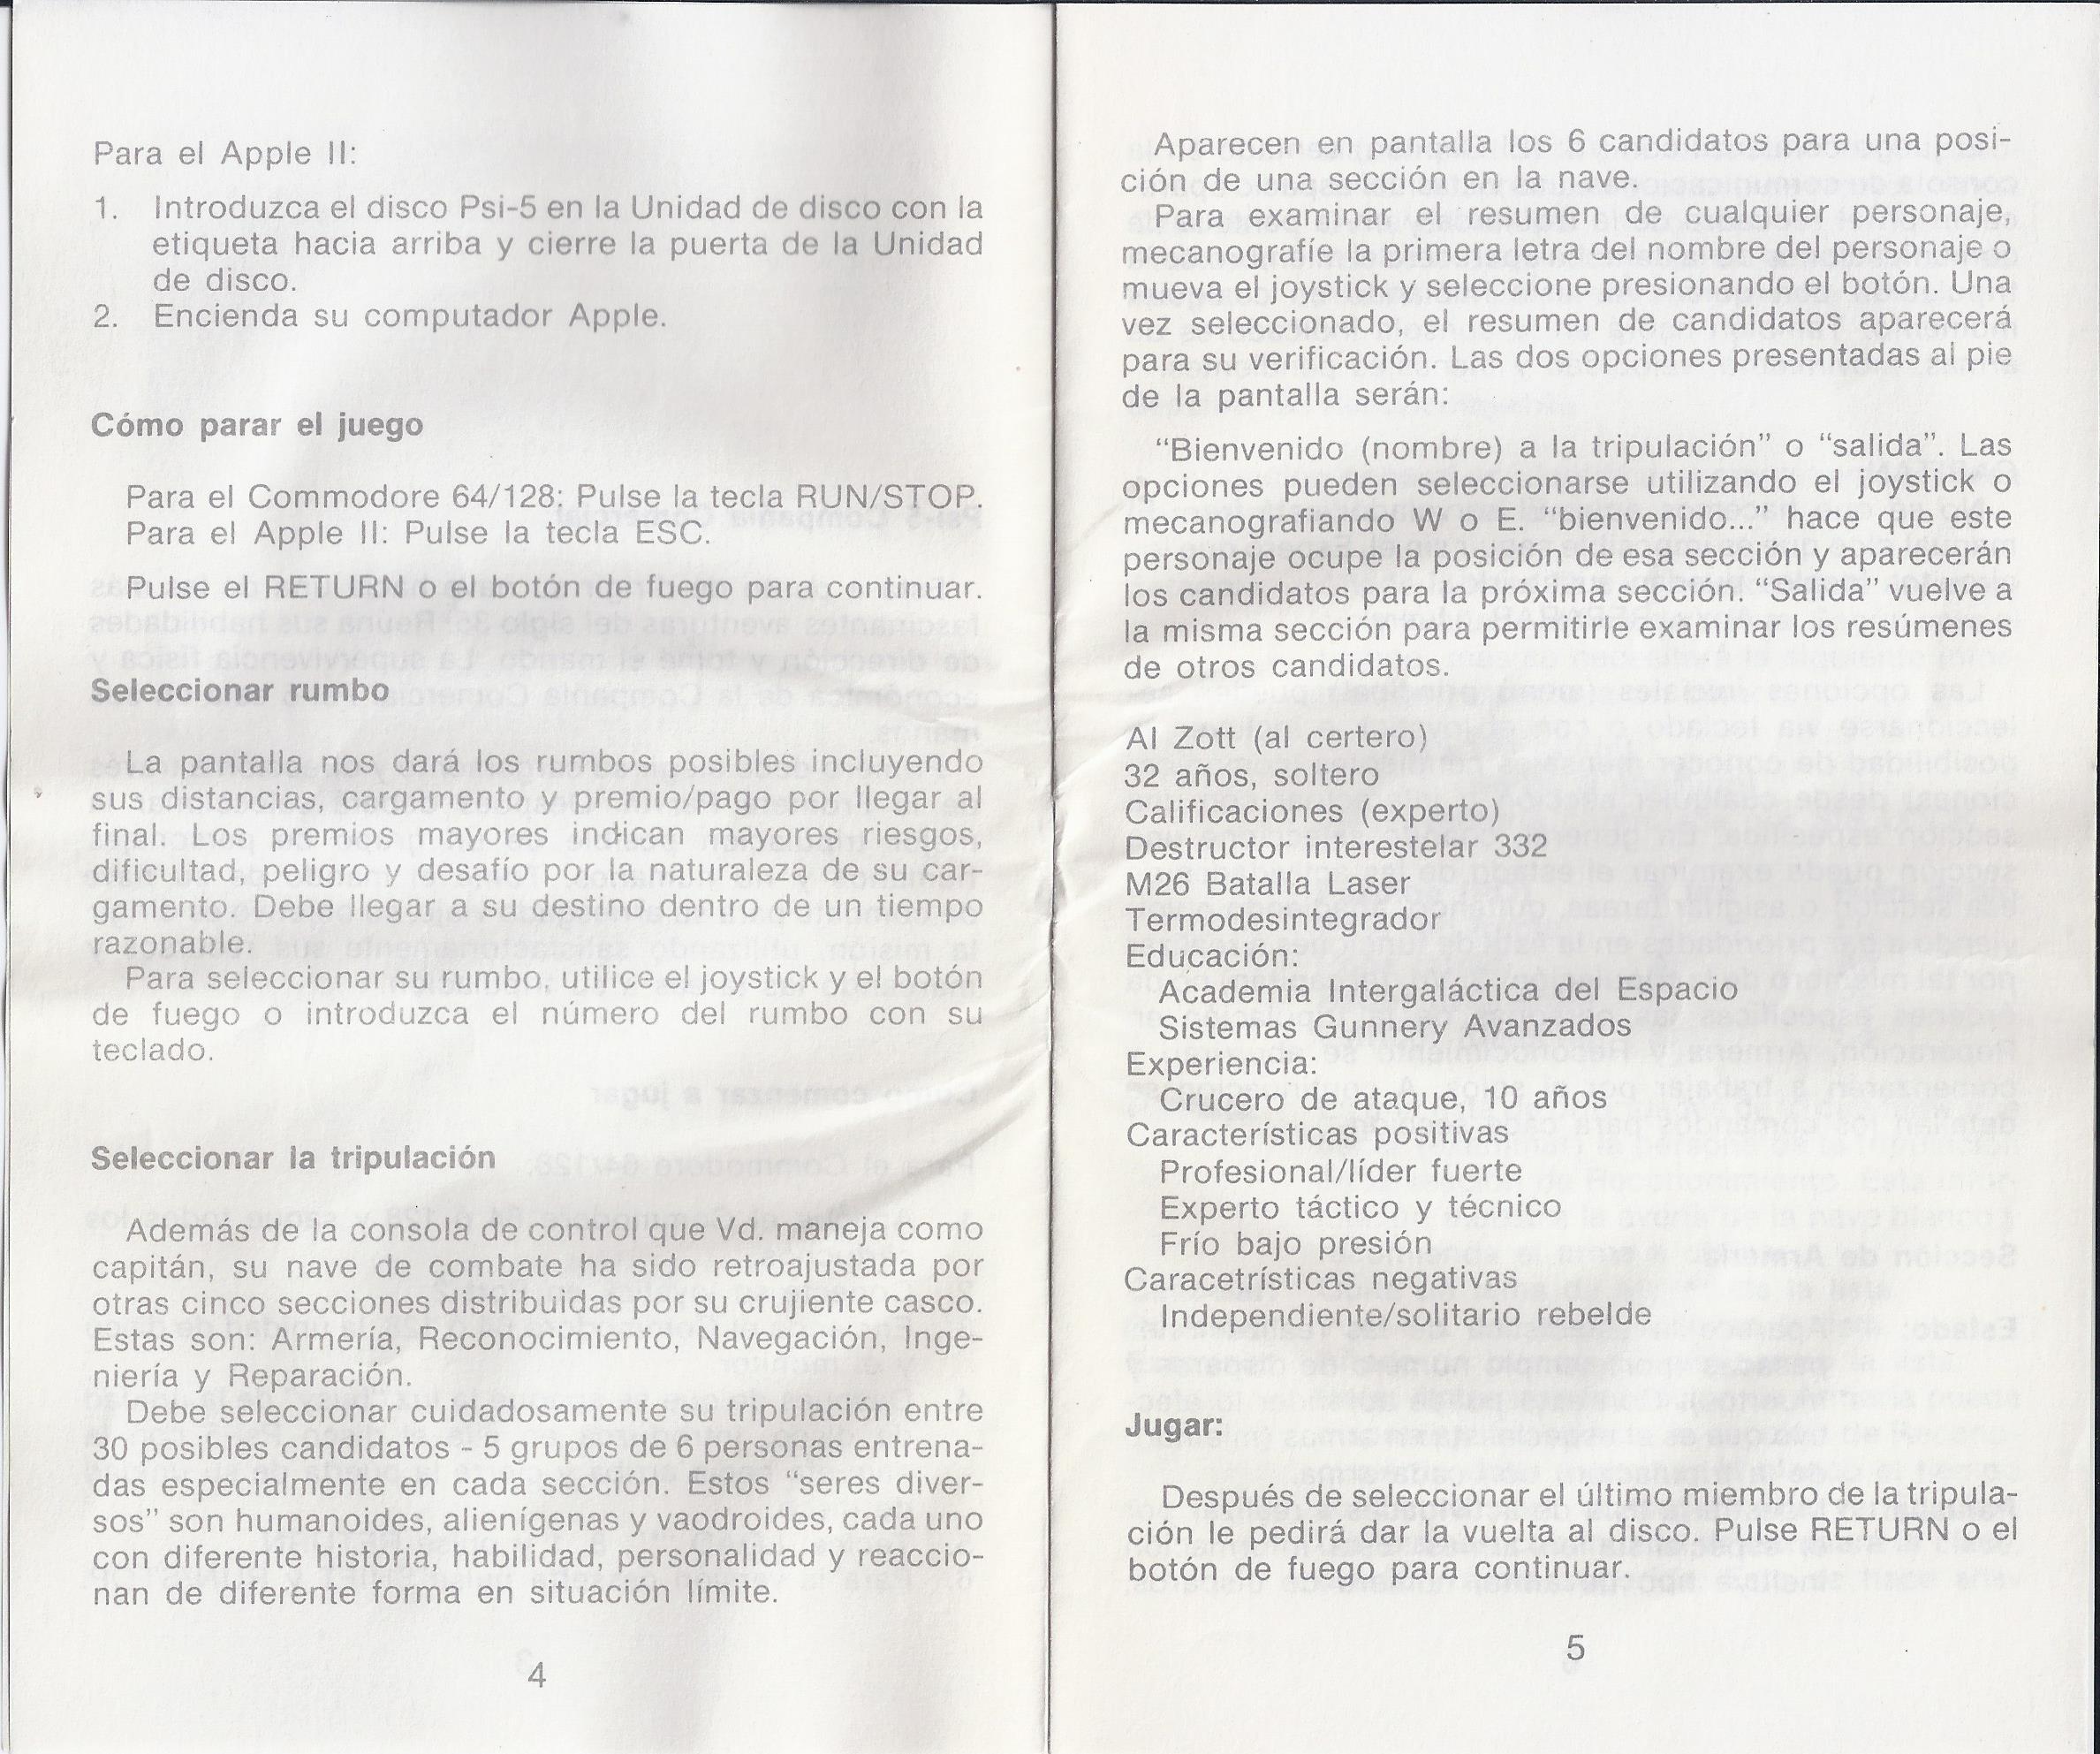 Psi 5 Trading Company (1985) (Juegos - Extranjeros) - IND